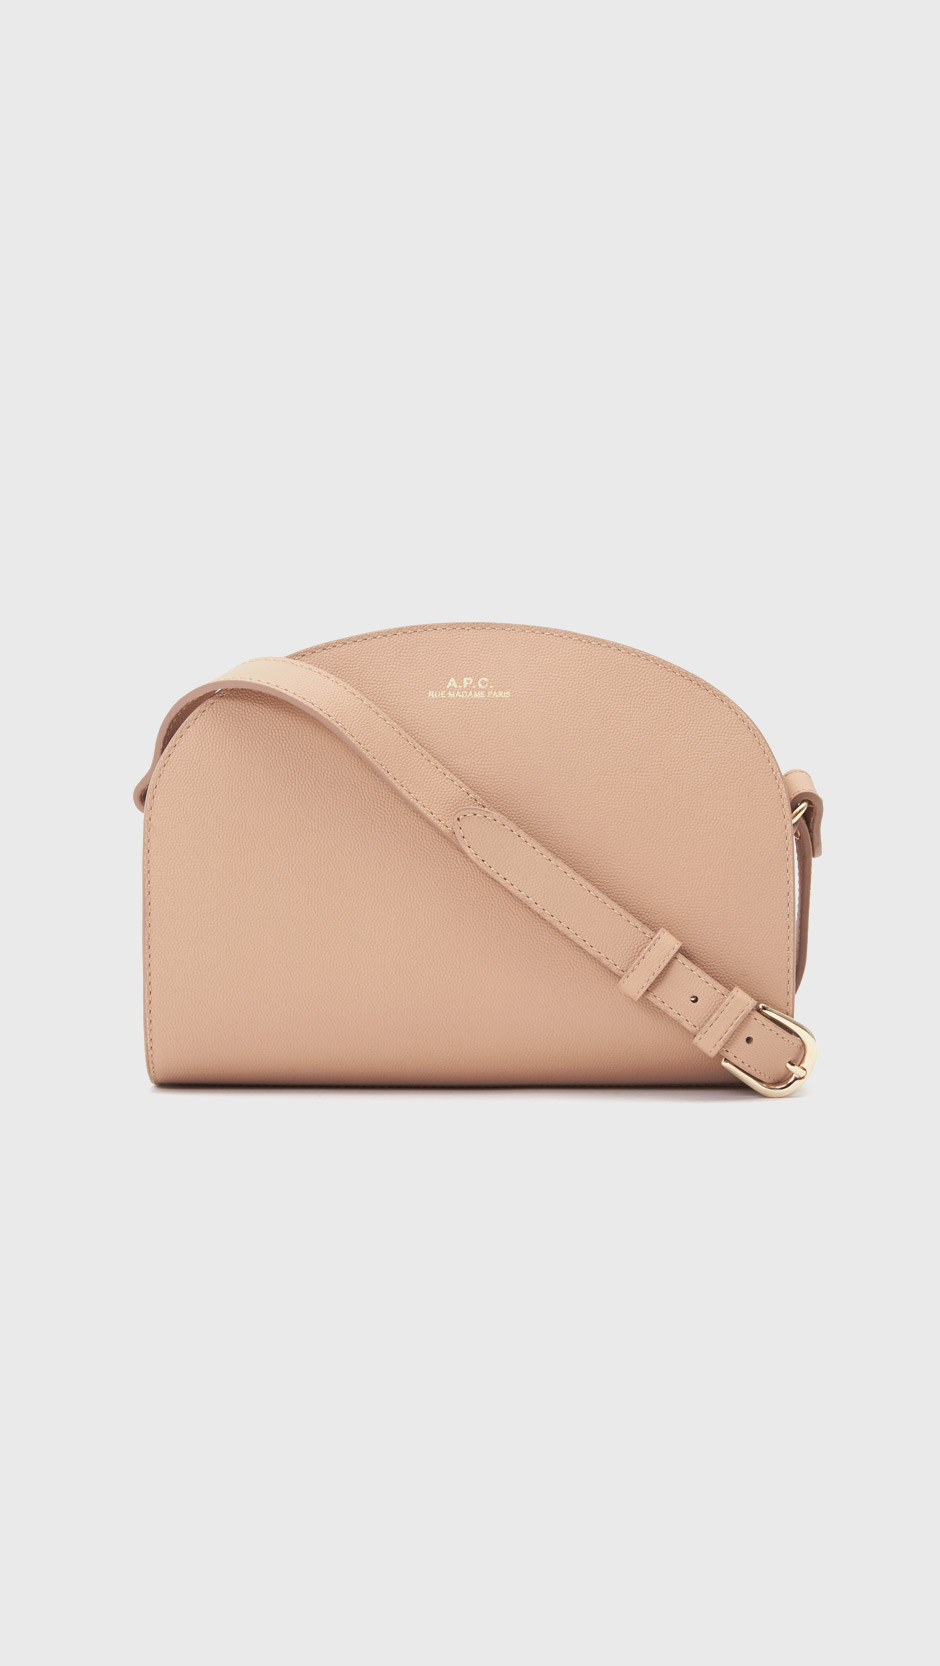 lyst a p c neutral pink half moon bag in pink. Black Bedroom Furniture Sets. Home Design Ideas